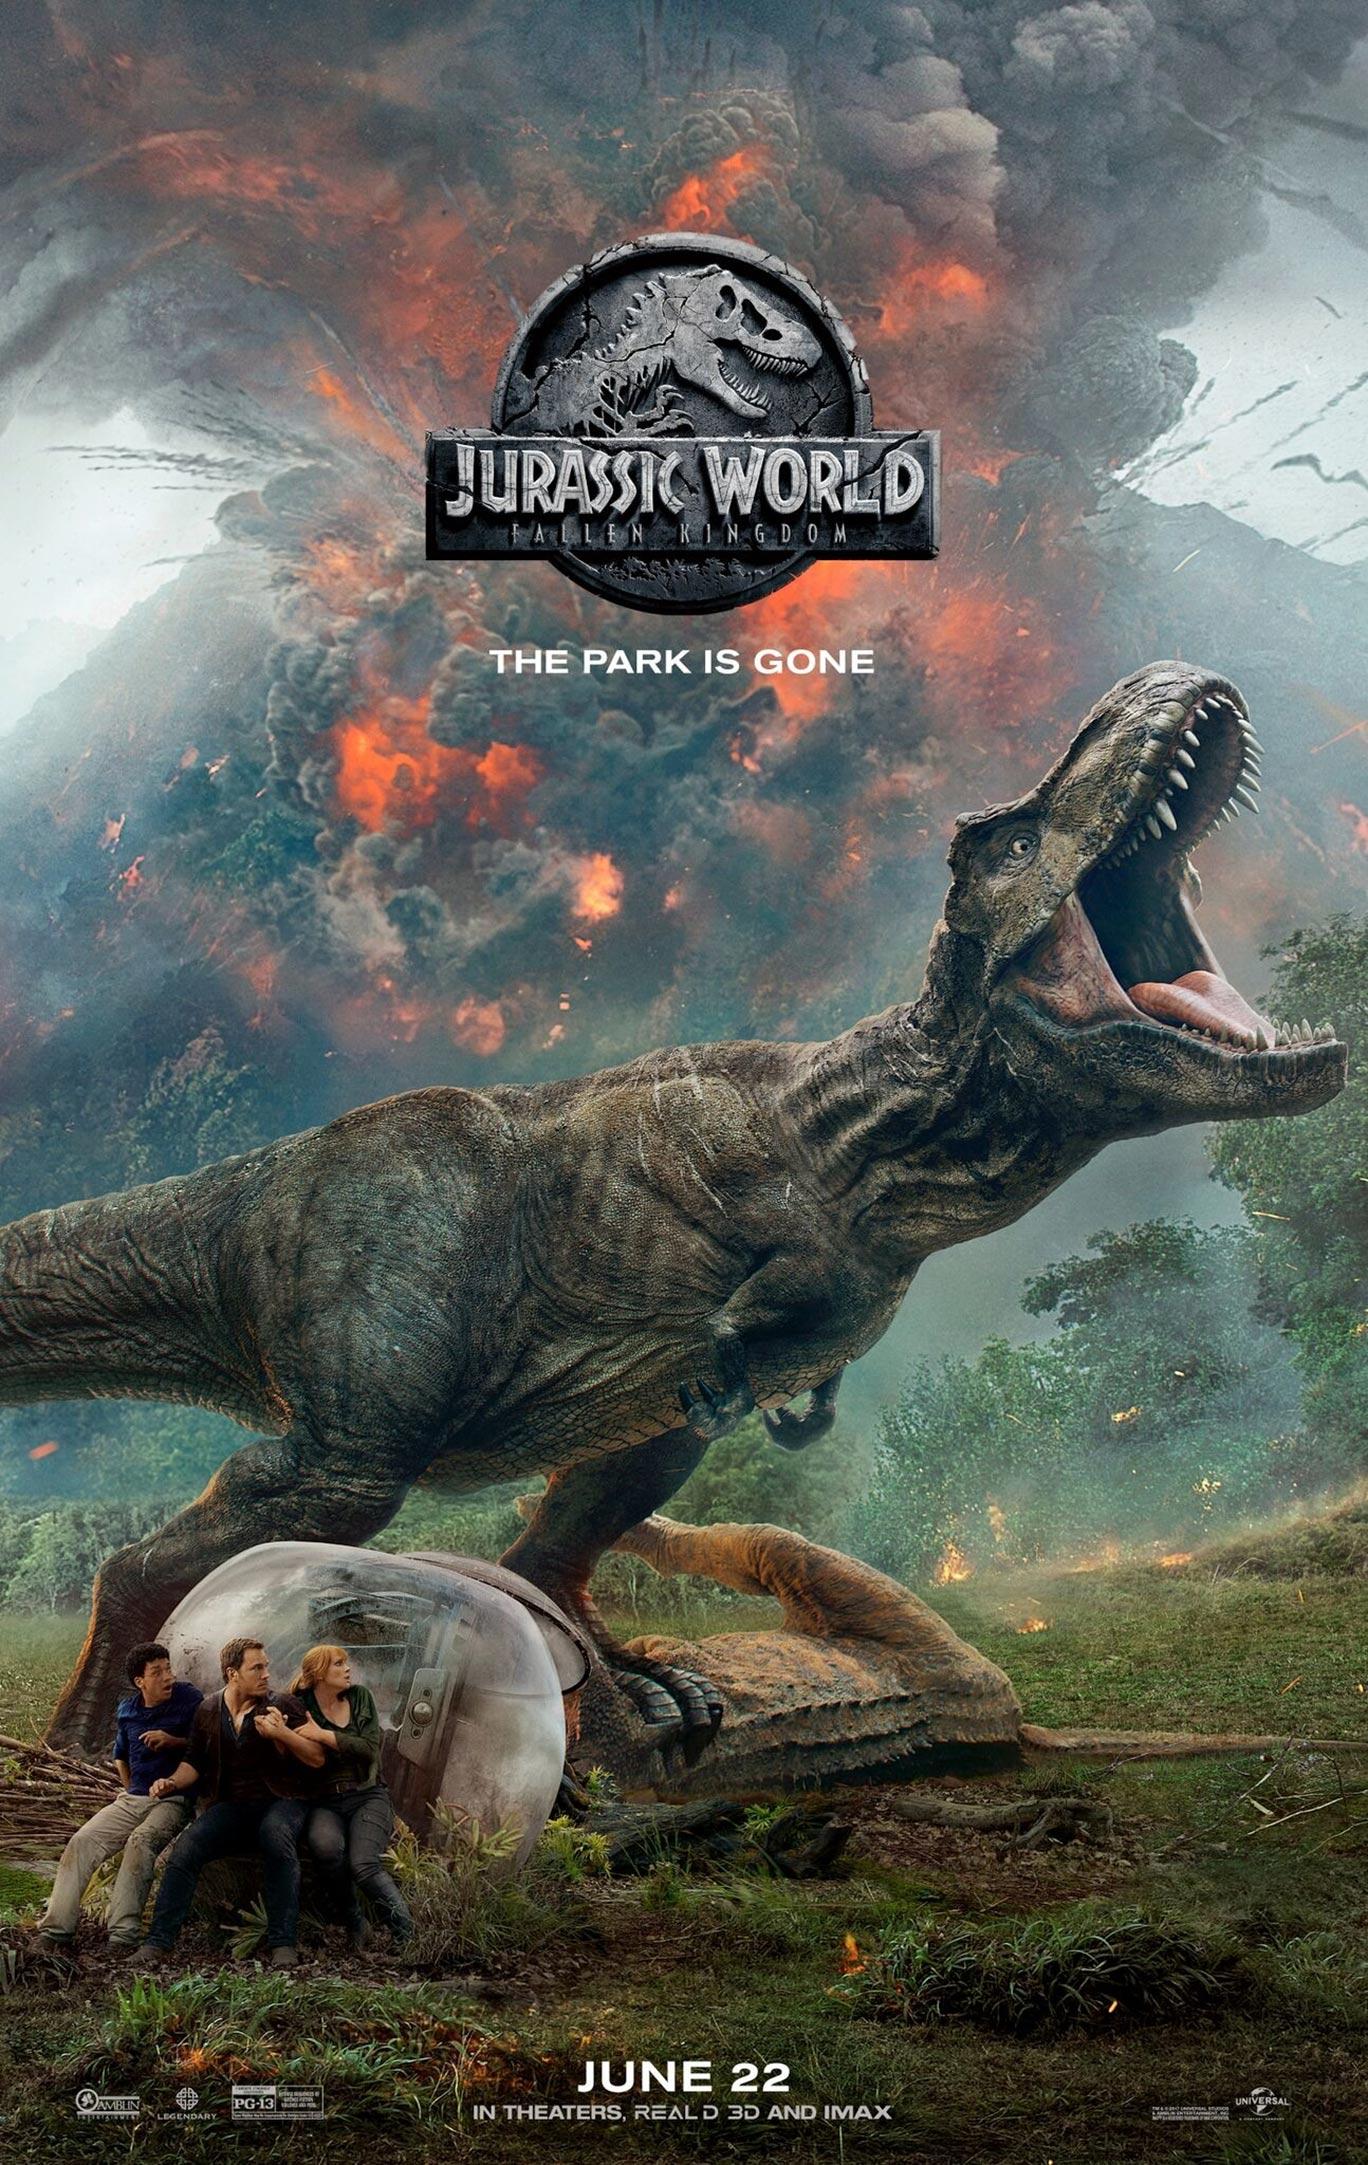 Jurassic World: Fallen Kingdom Poster #4